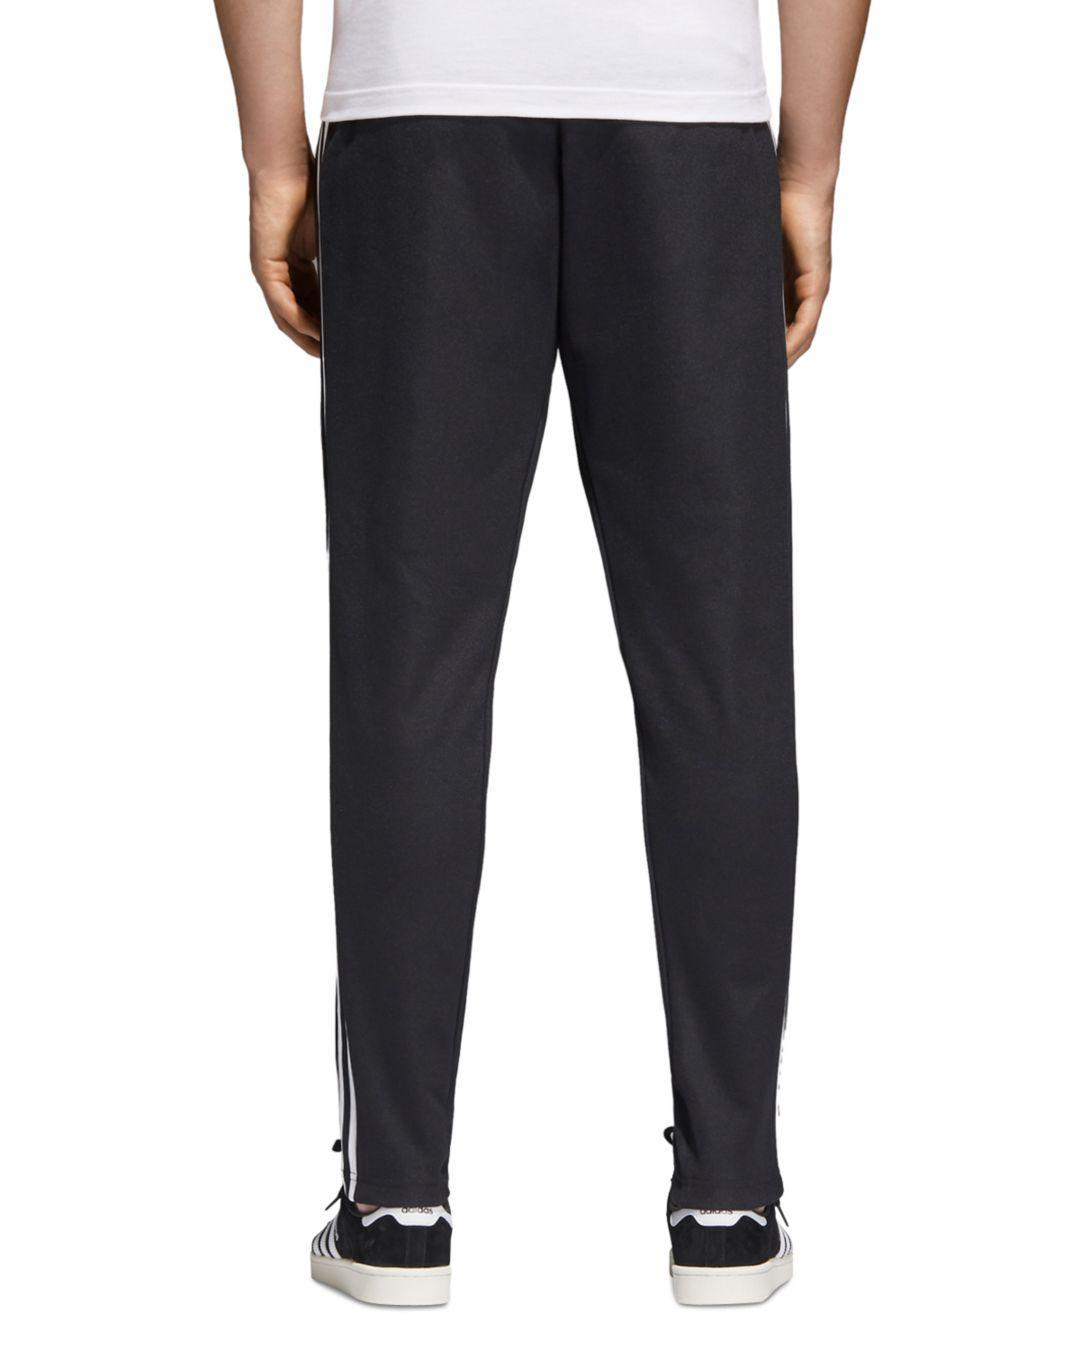 adidas Men's Originals Beckenbauer Track Pants in Black for